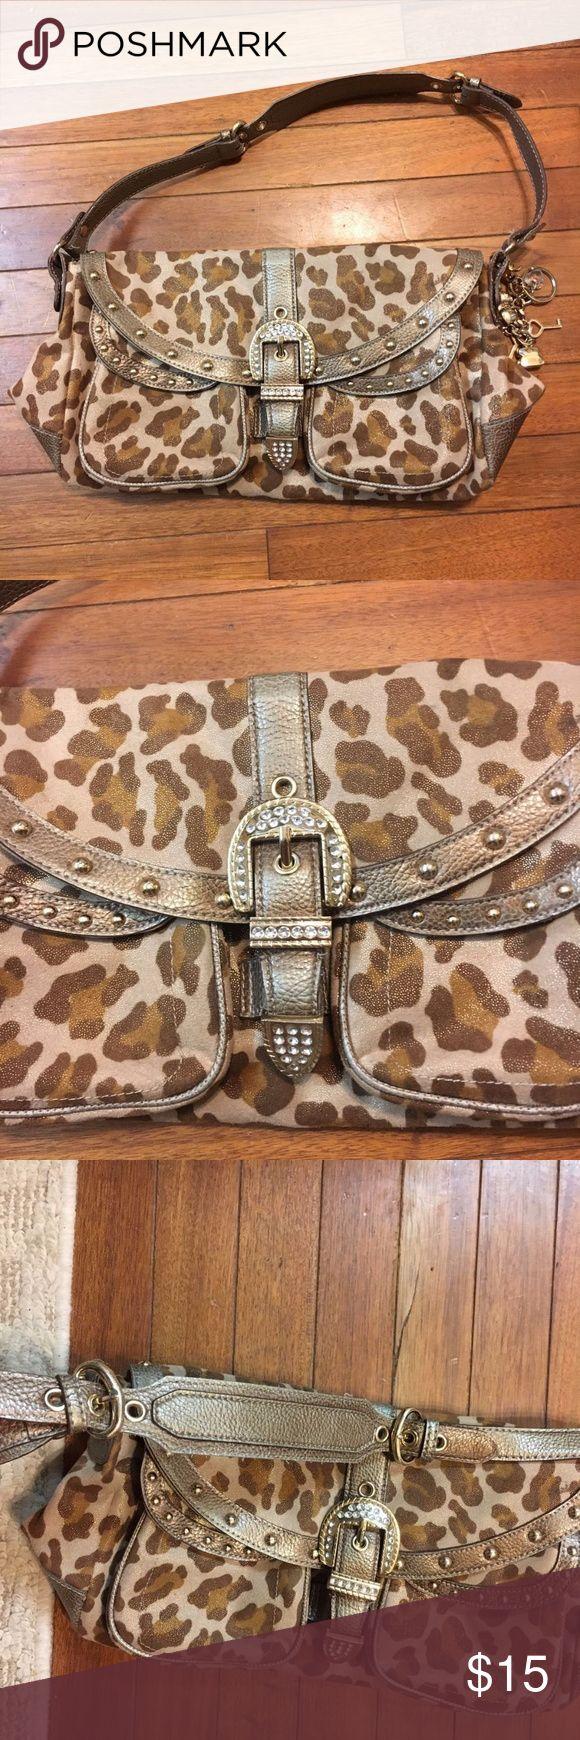 Kathy Van Zeeland Suede Leopard Purse Hand bag Pre Loved condition. Kathy Van Zeeland Bags Shoulder Bags